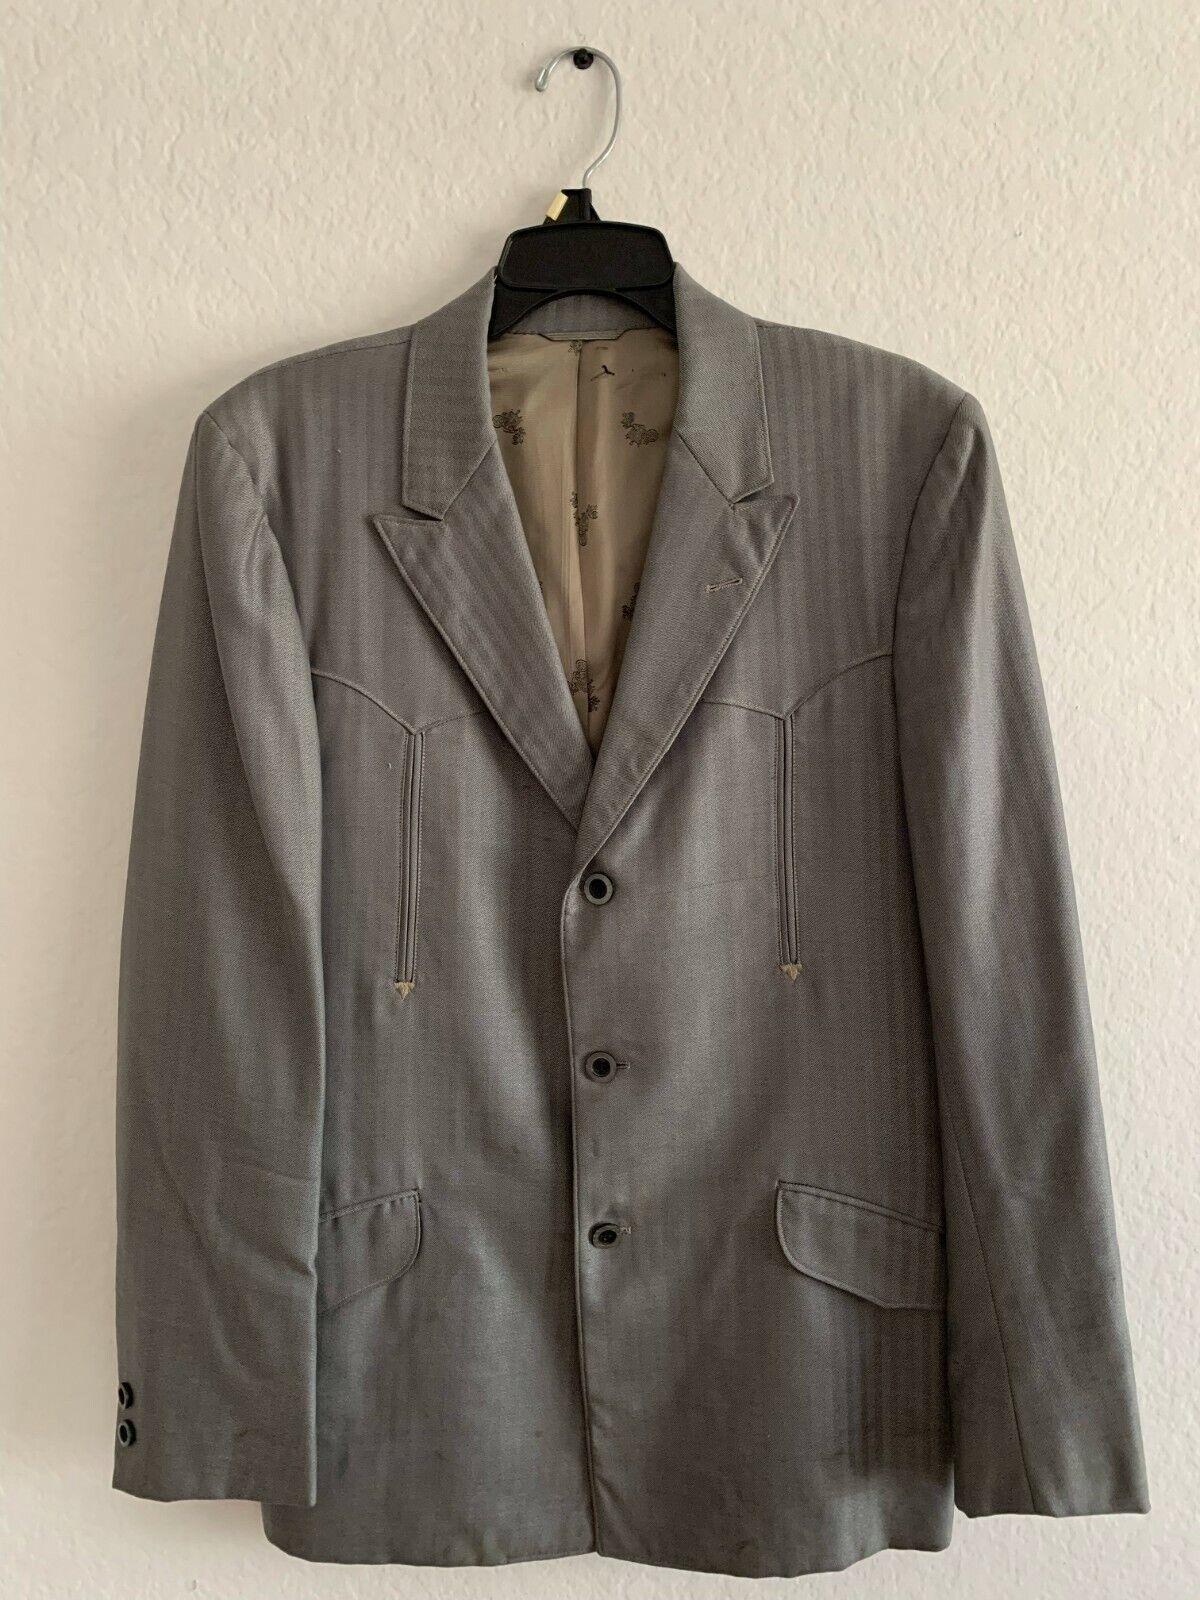 1970s Men's Vintage Western Suit Jacket -Silver- - image 1